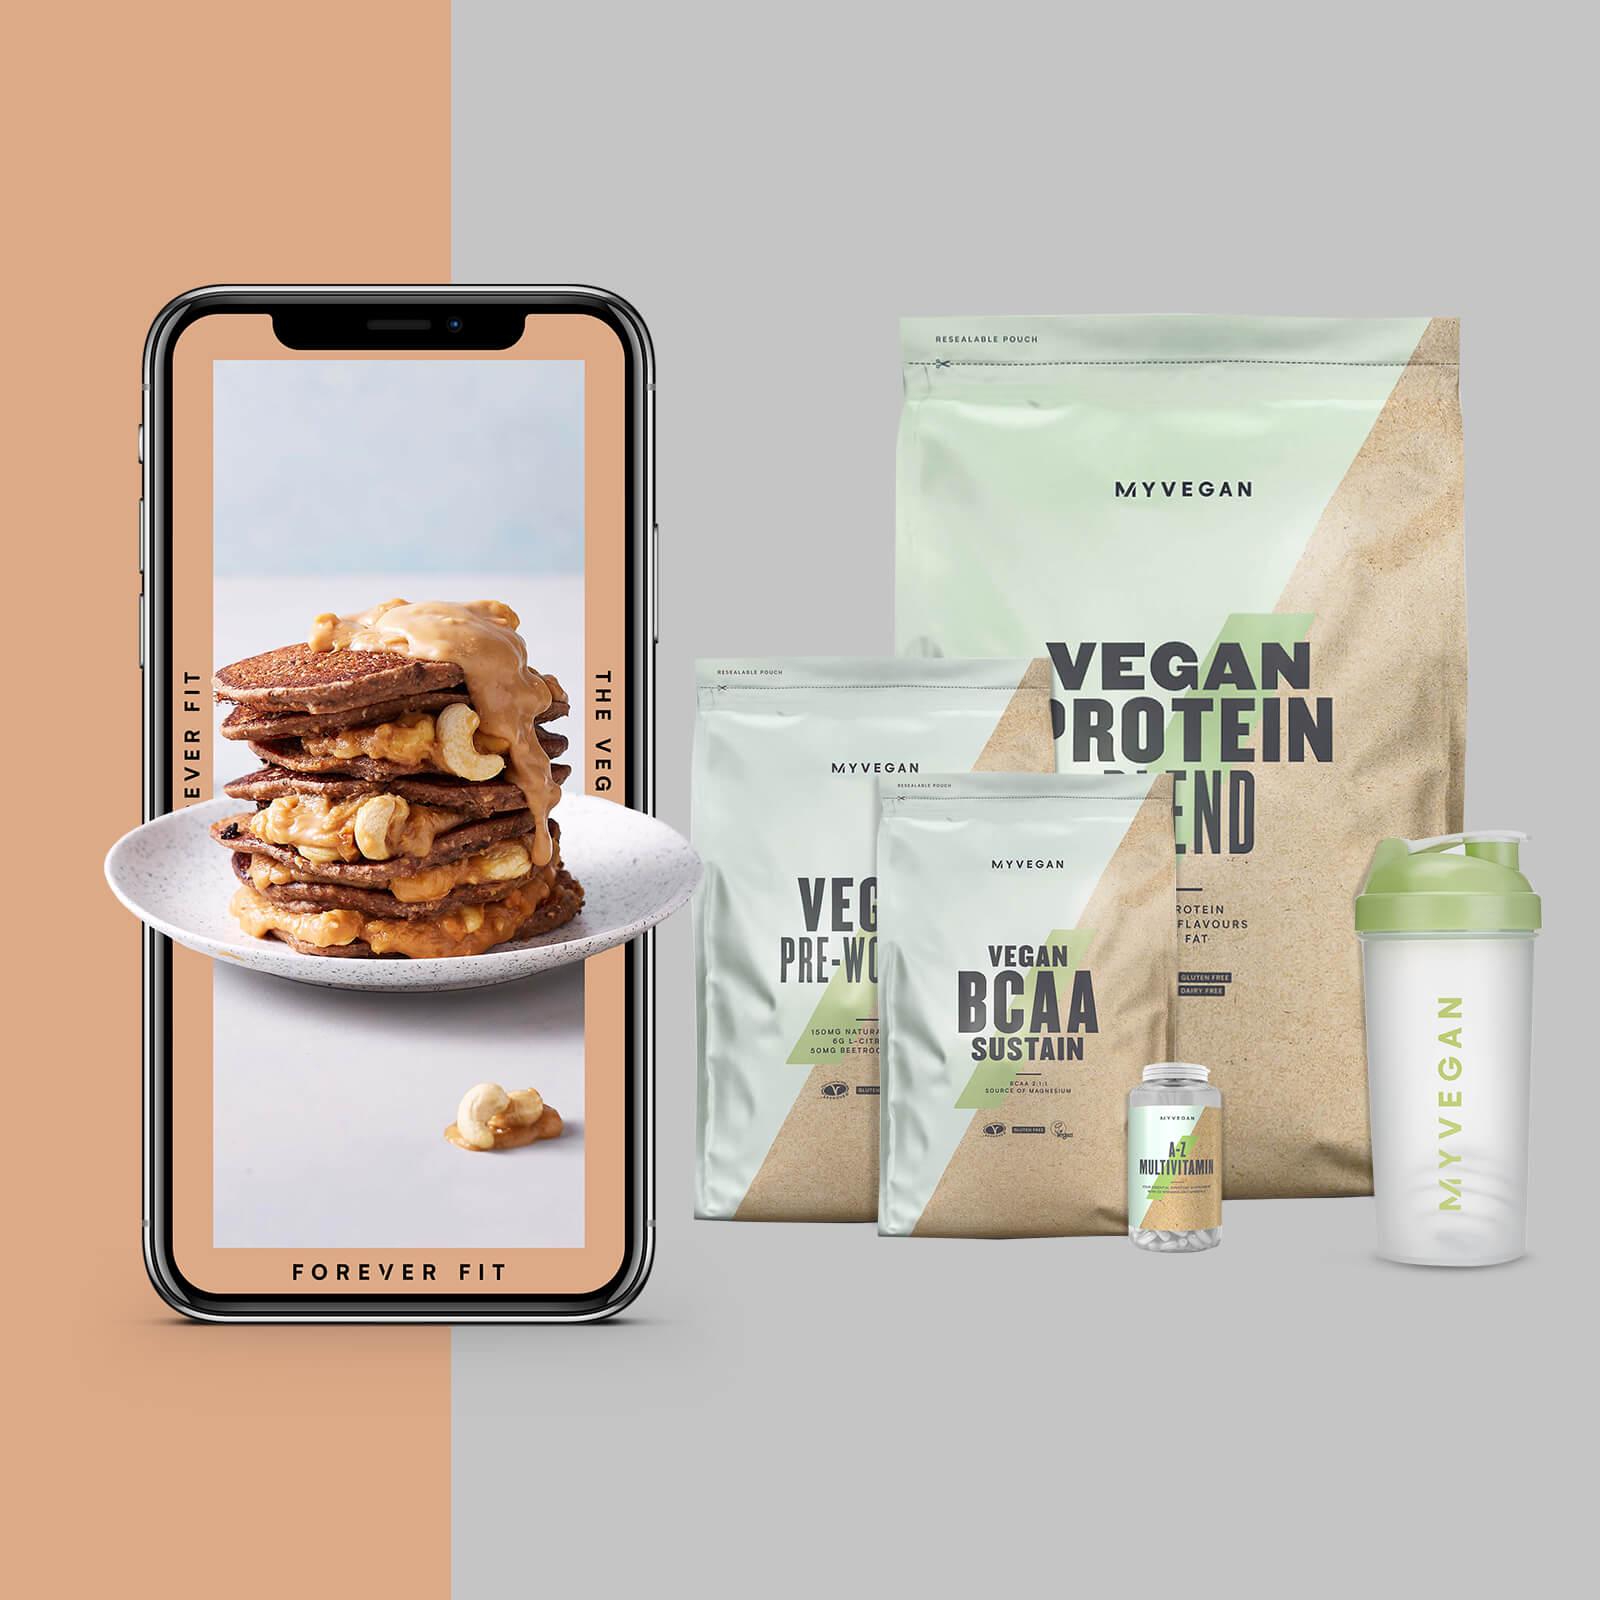 Le Pack Vegan + Guide Entraînement et Nutrition Offert - Raspberry Lemonade - Lemon Tea - Coffee and Walnut